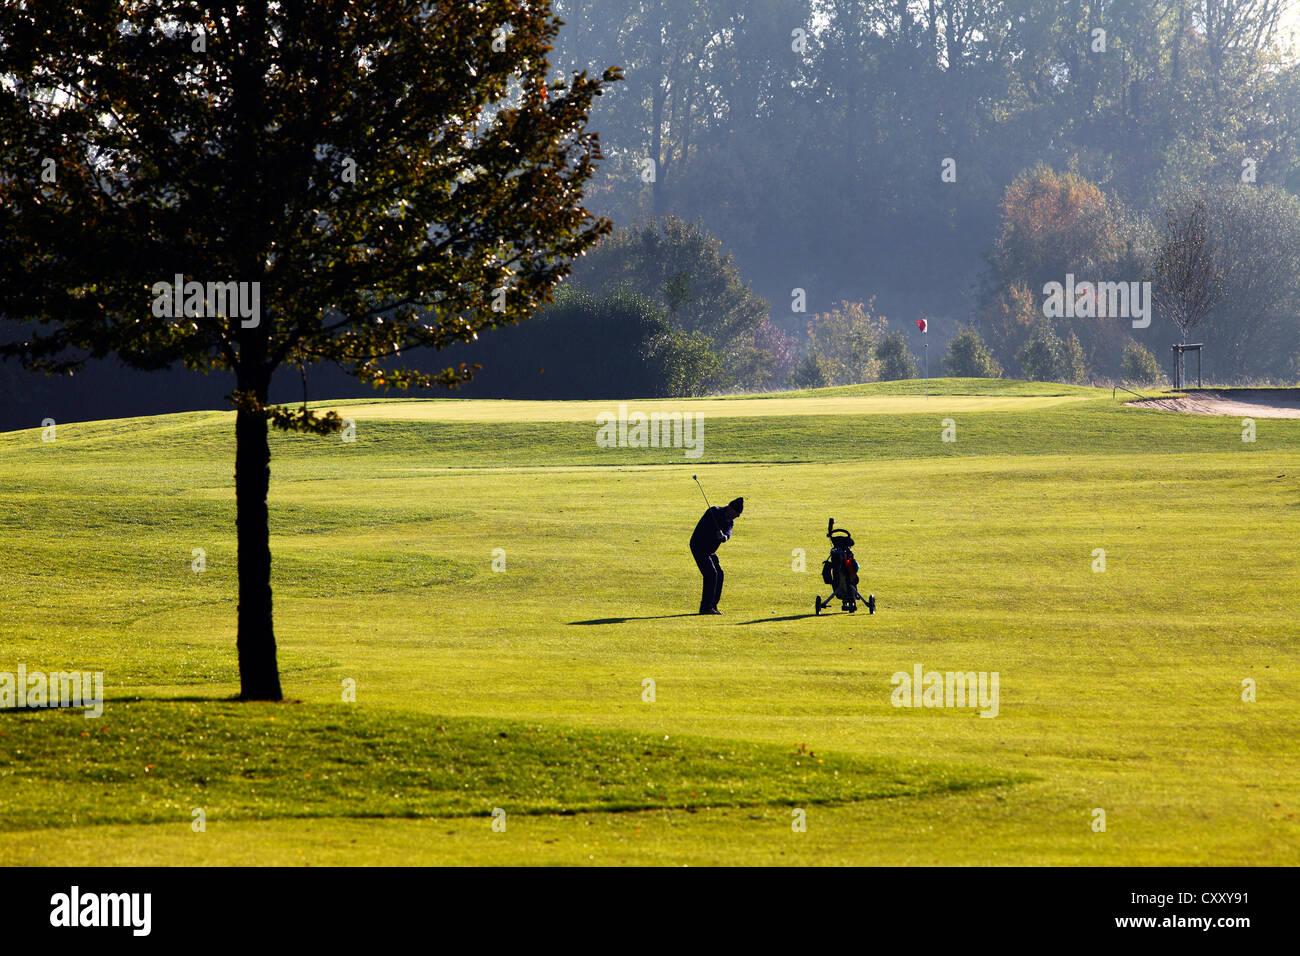 Schloss Horst golf course, lane 1, Par 5Gelsenkirchen, Germany - Stock Image